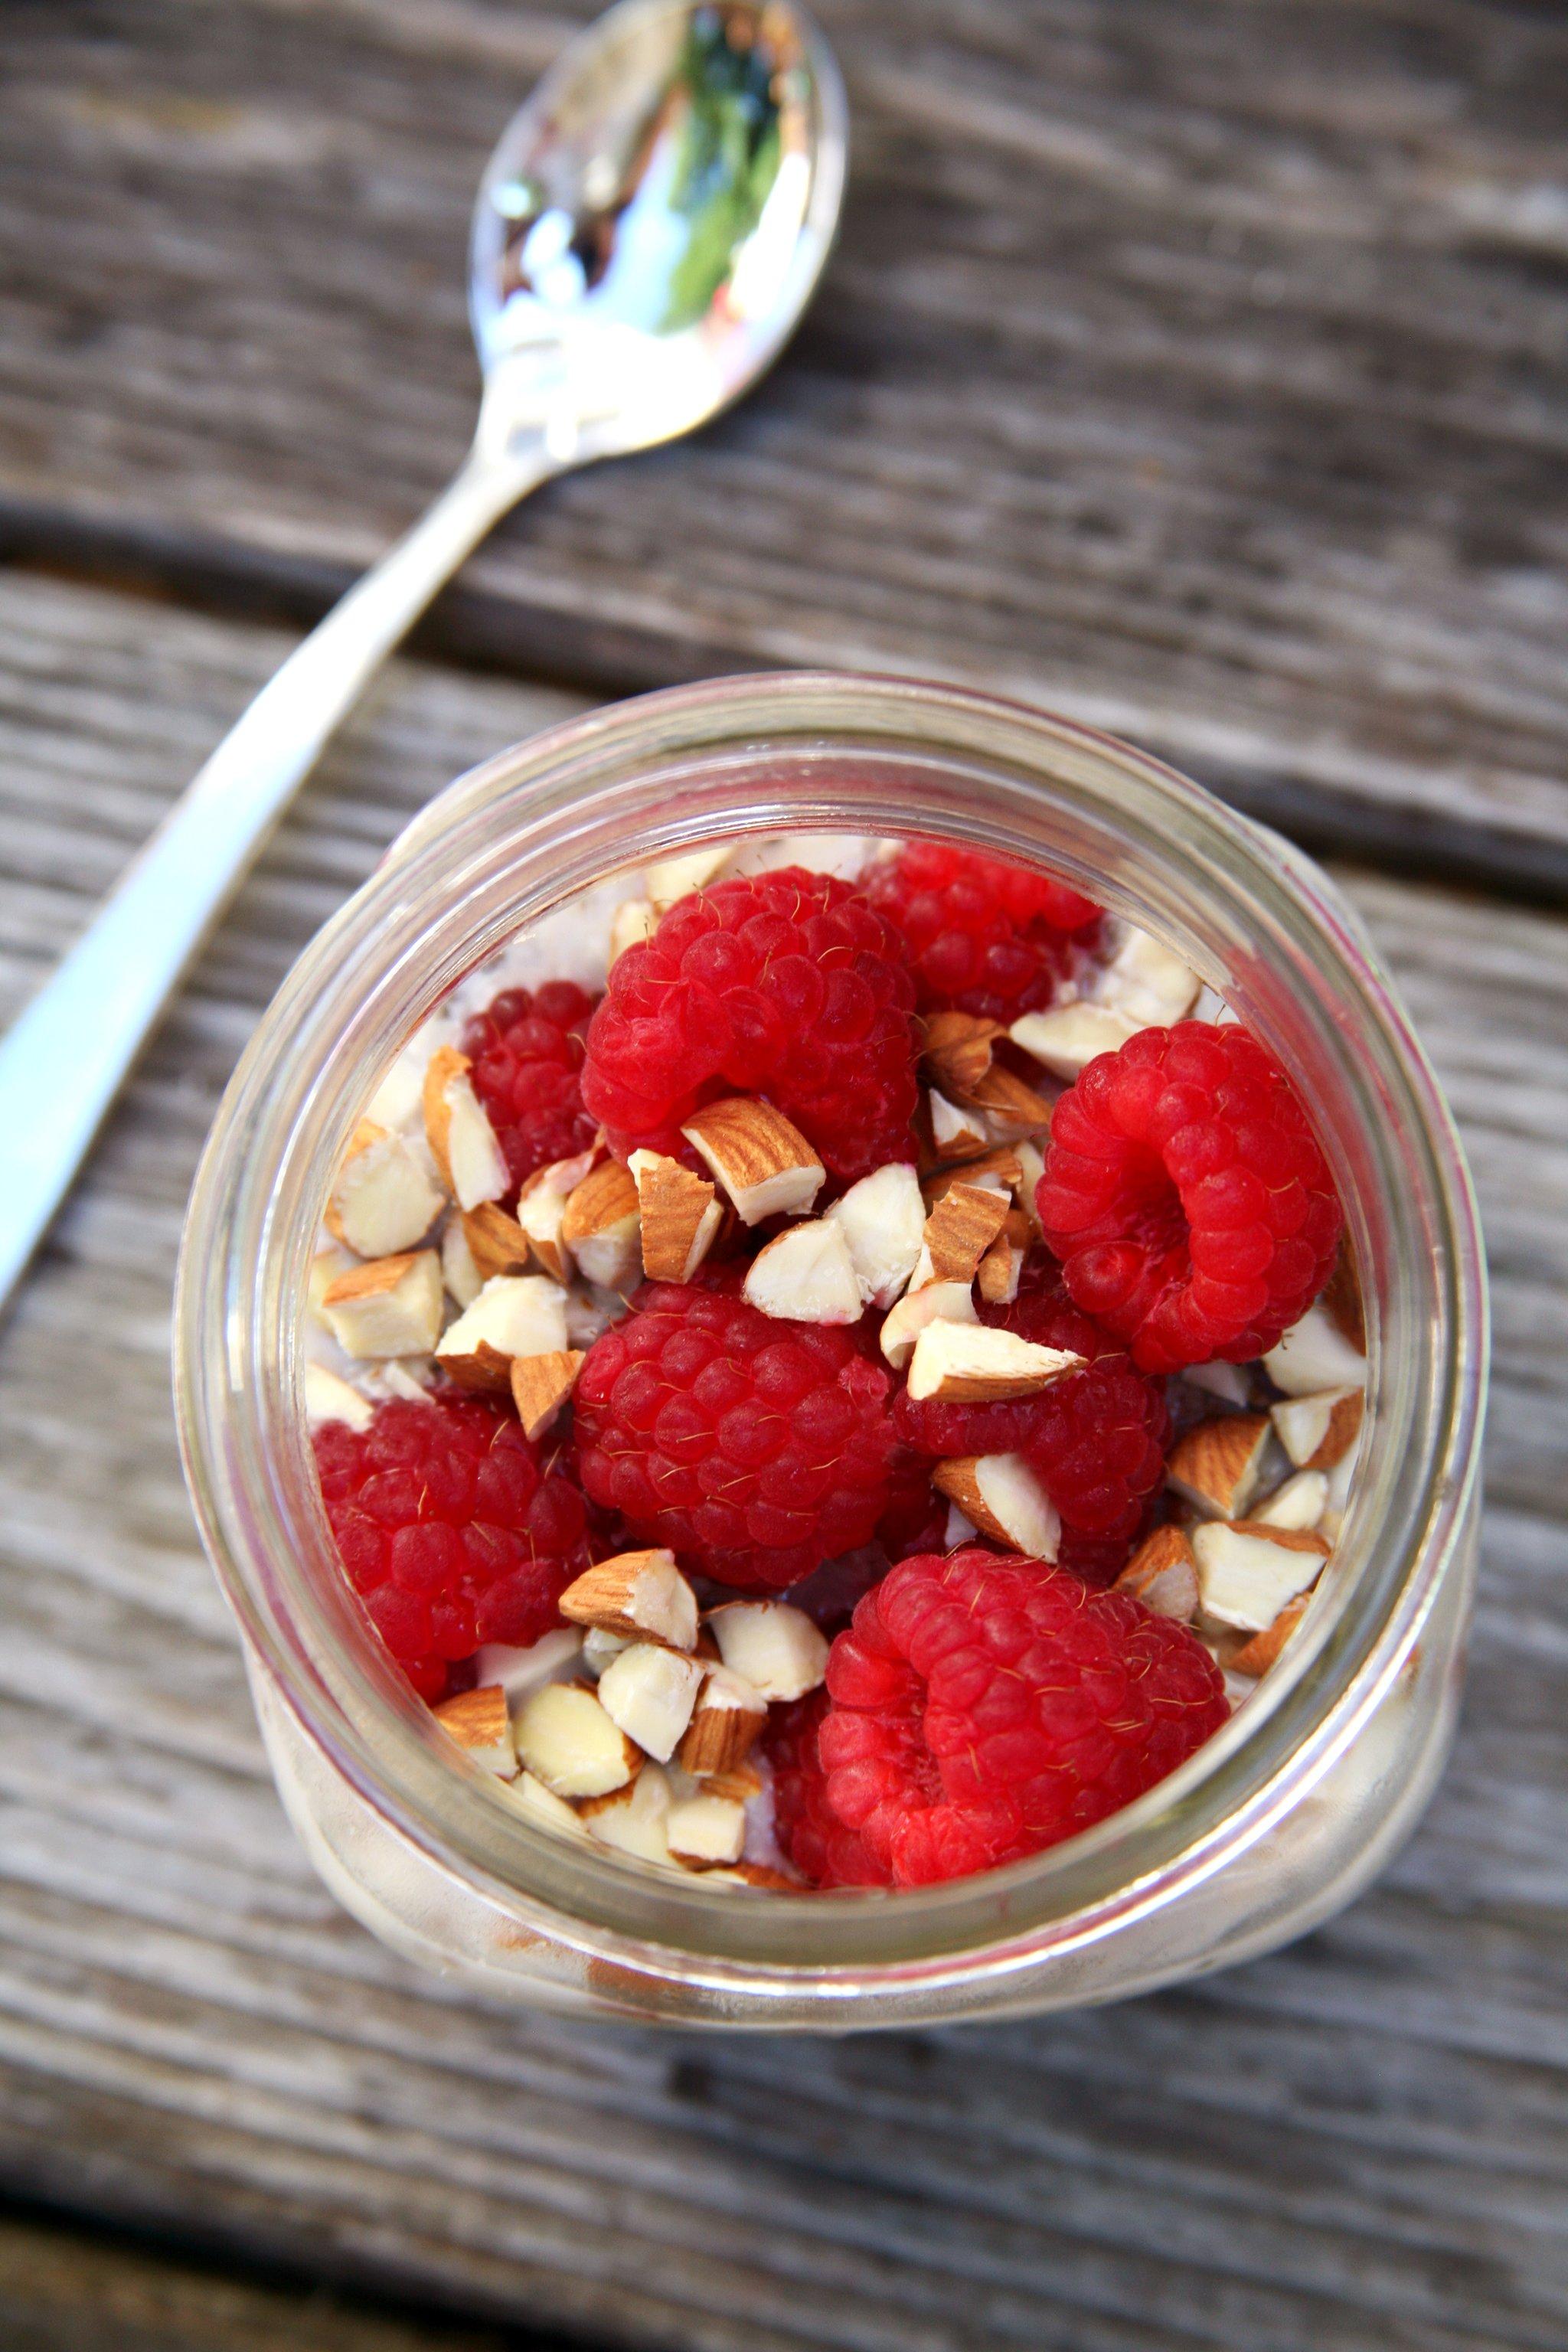 Overnight Oats – 20 Recipes to Delight